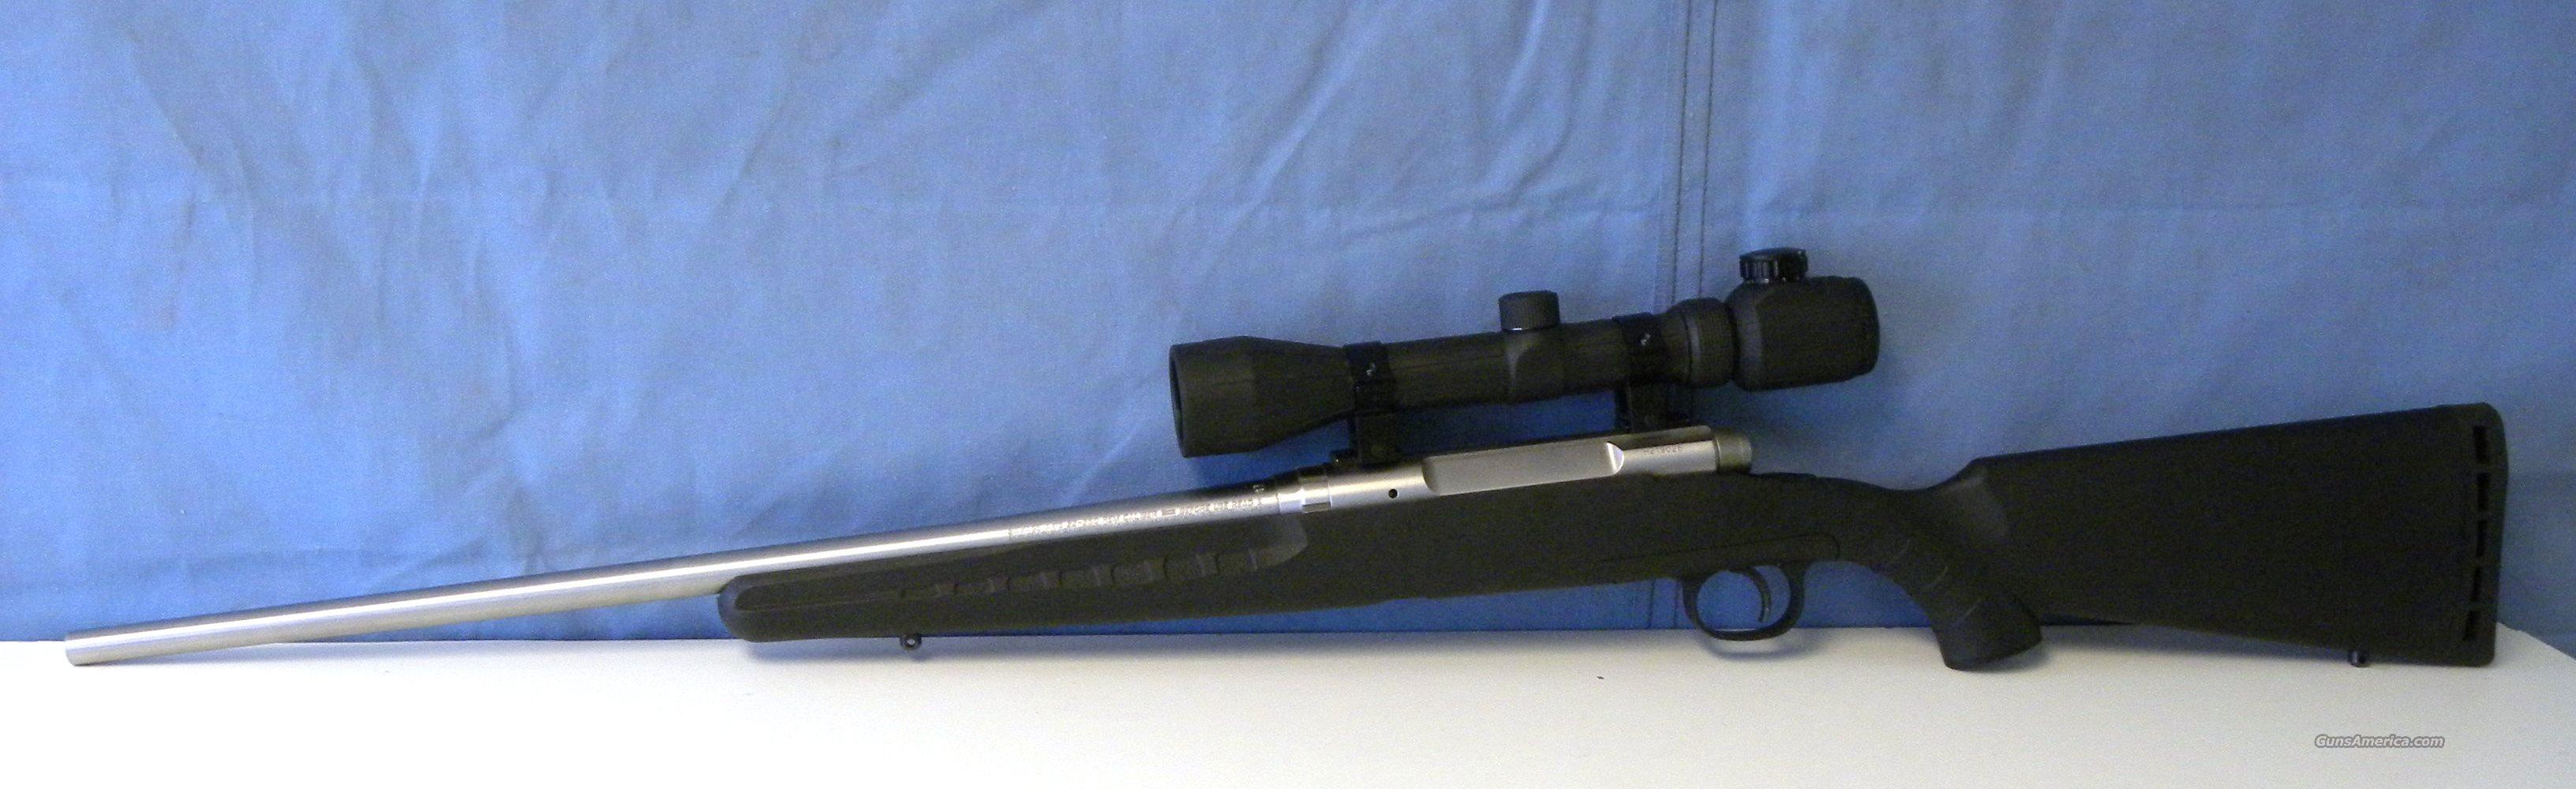 Savage Axis SS 22-250  Guns > Rifles > Savage Rifles > Standard Bolt Action > Sporting